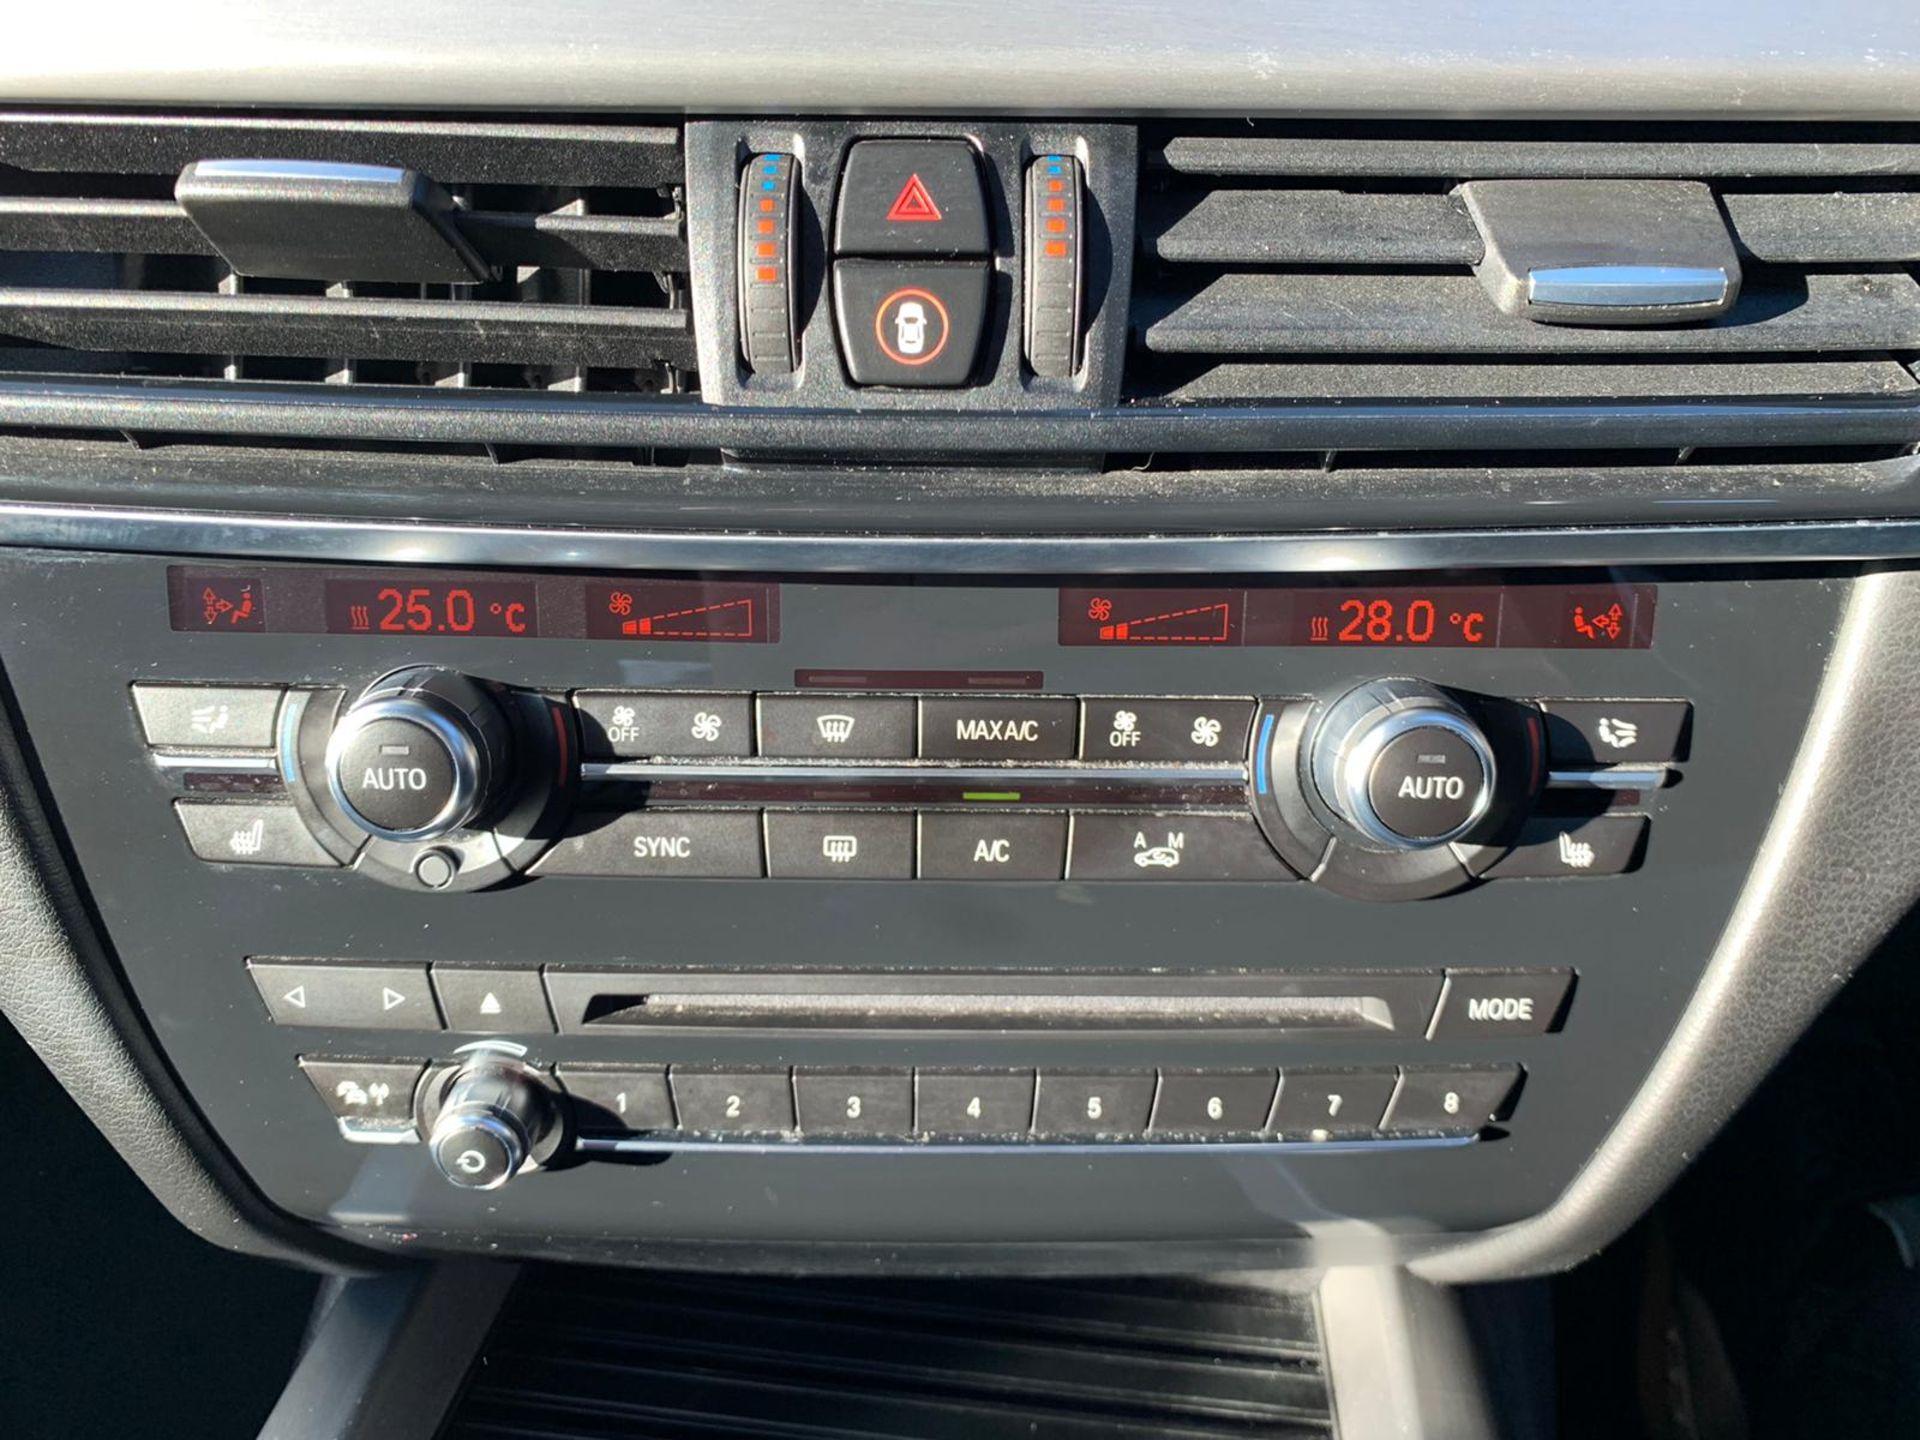 "(Reserve Met) BMW X5 2.0d S-DRIVE ""Special Equipment"" Auto- 7 Seater -16 Reg - Sat Nav- (New Shape) - Image 40 of 43"